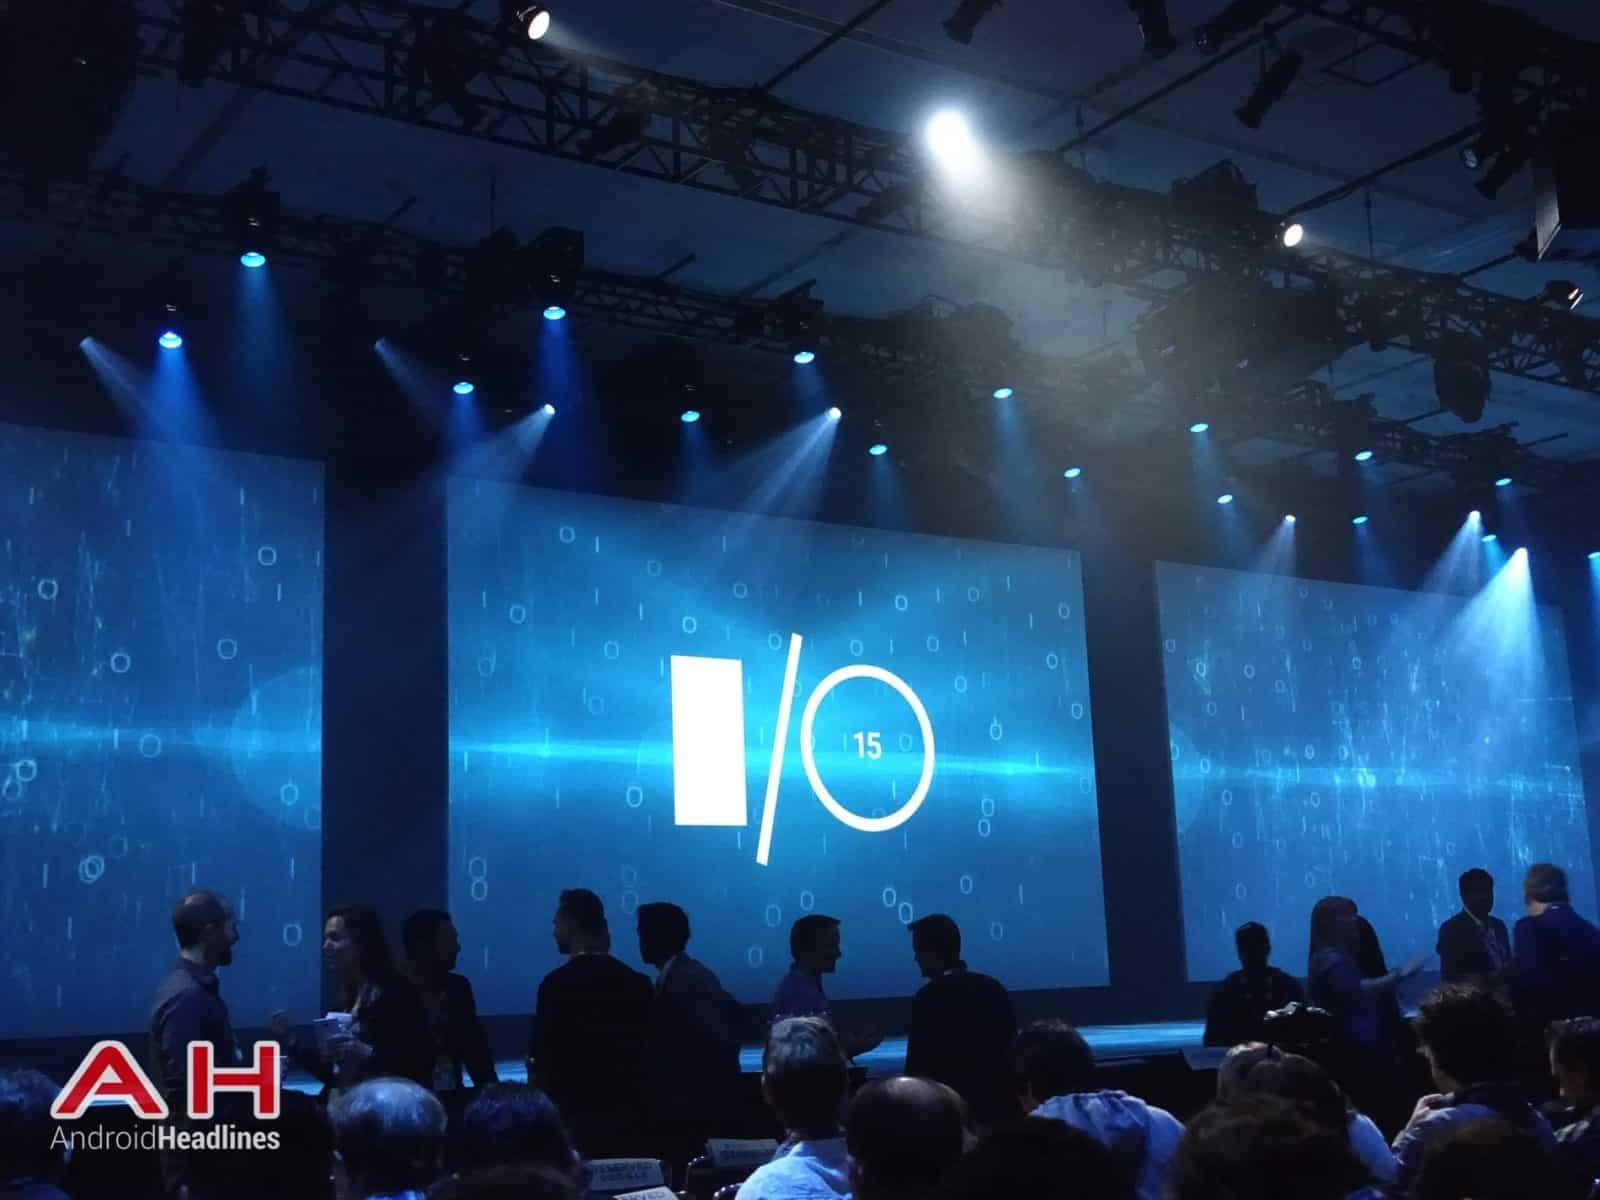 IO 15 LIVE AH